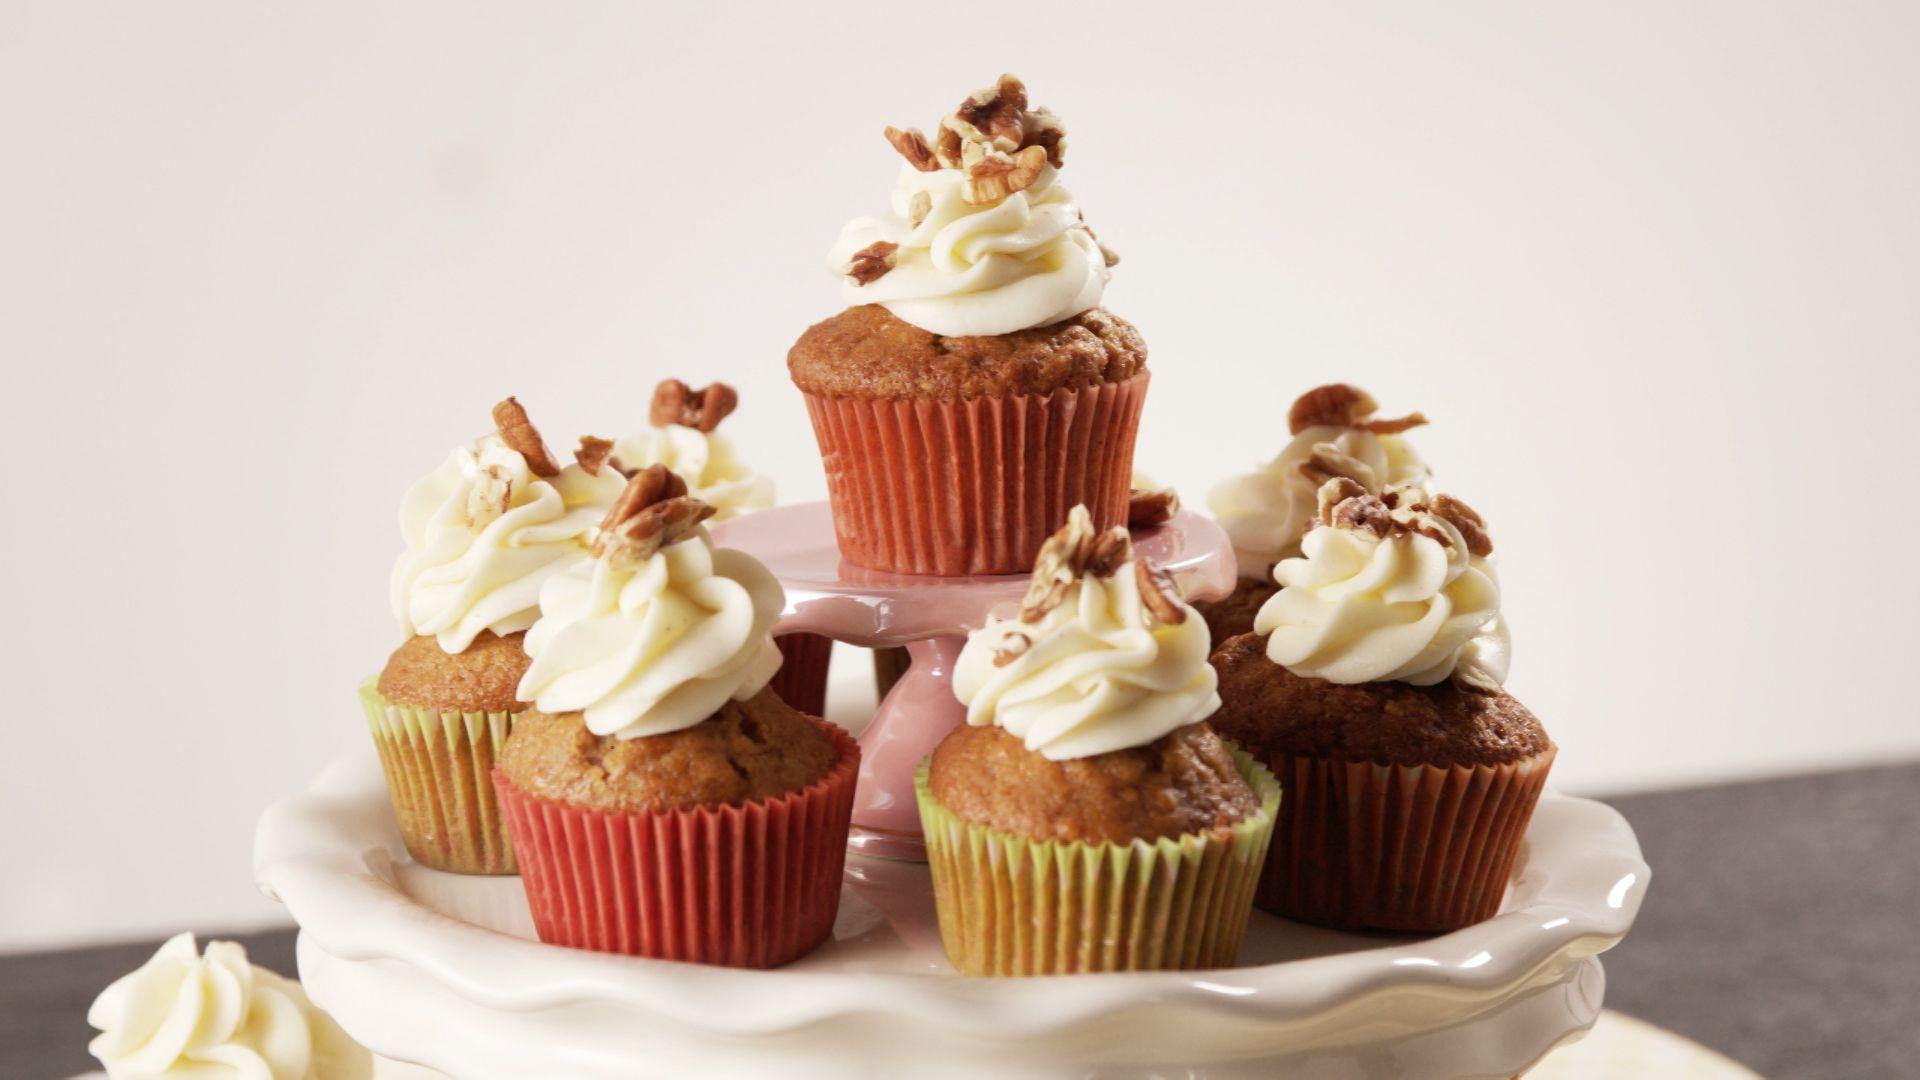 Carrot Cake Cupcakes Still 2.jpg